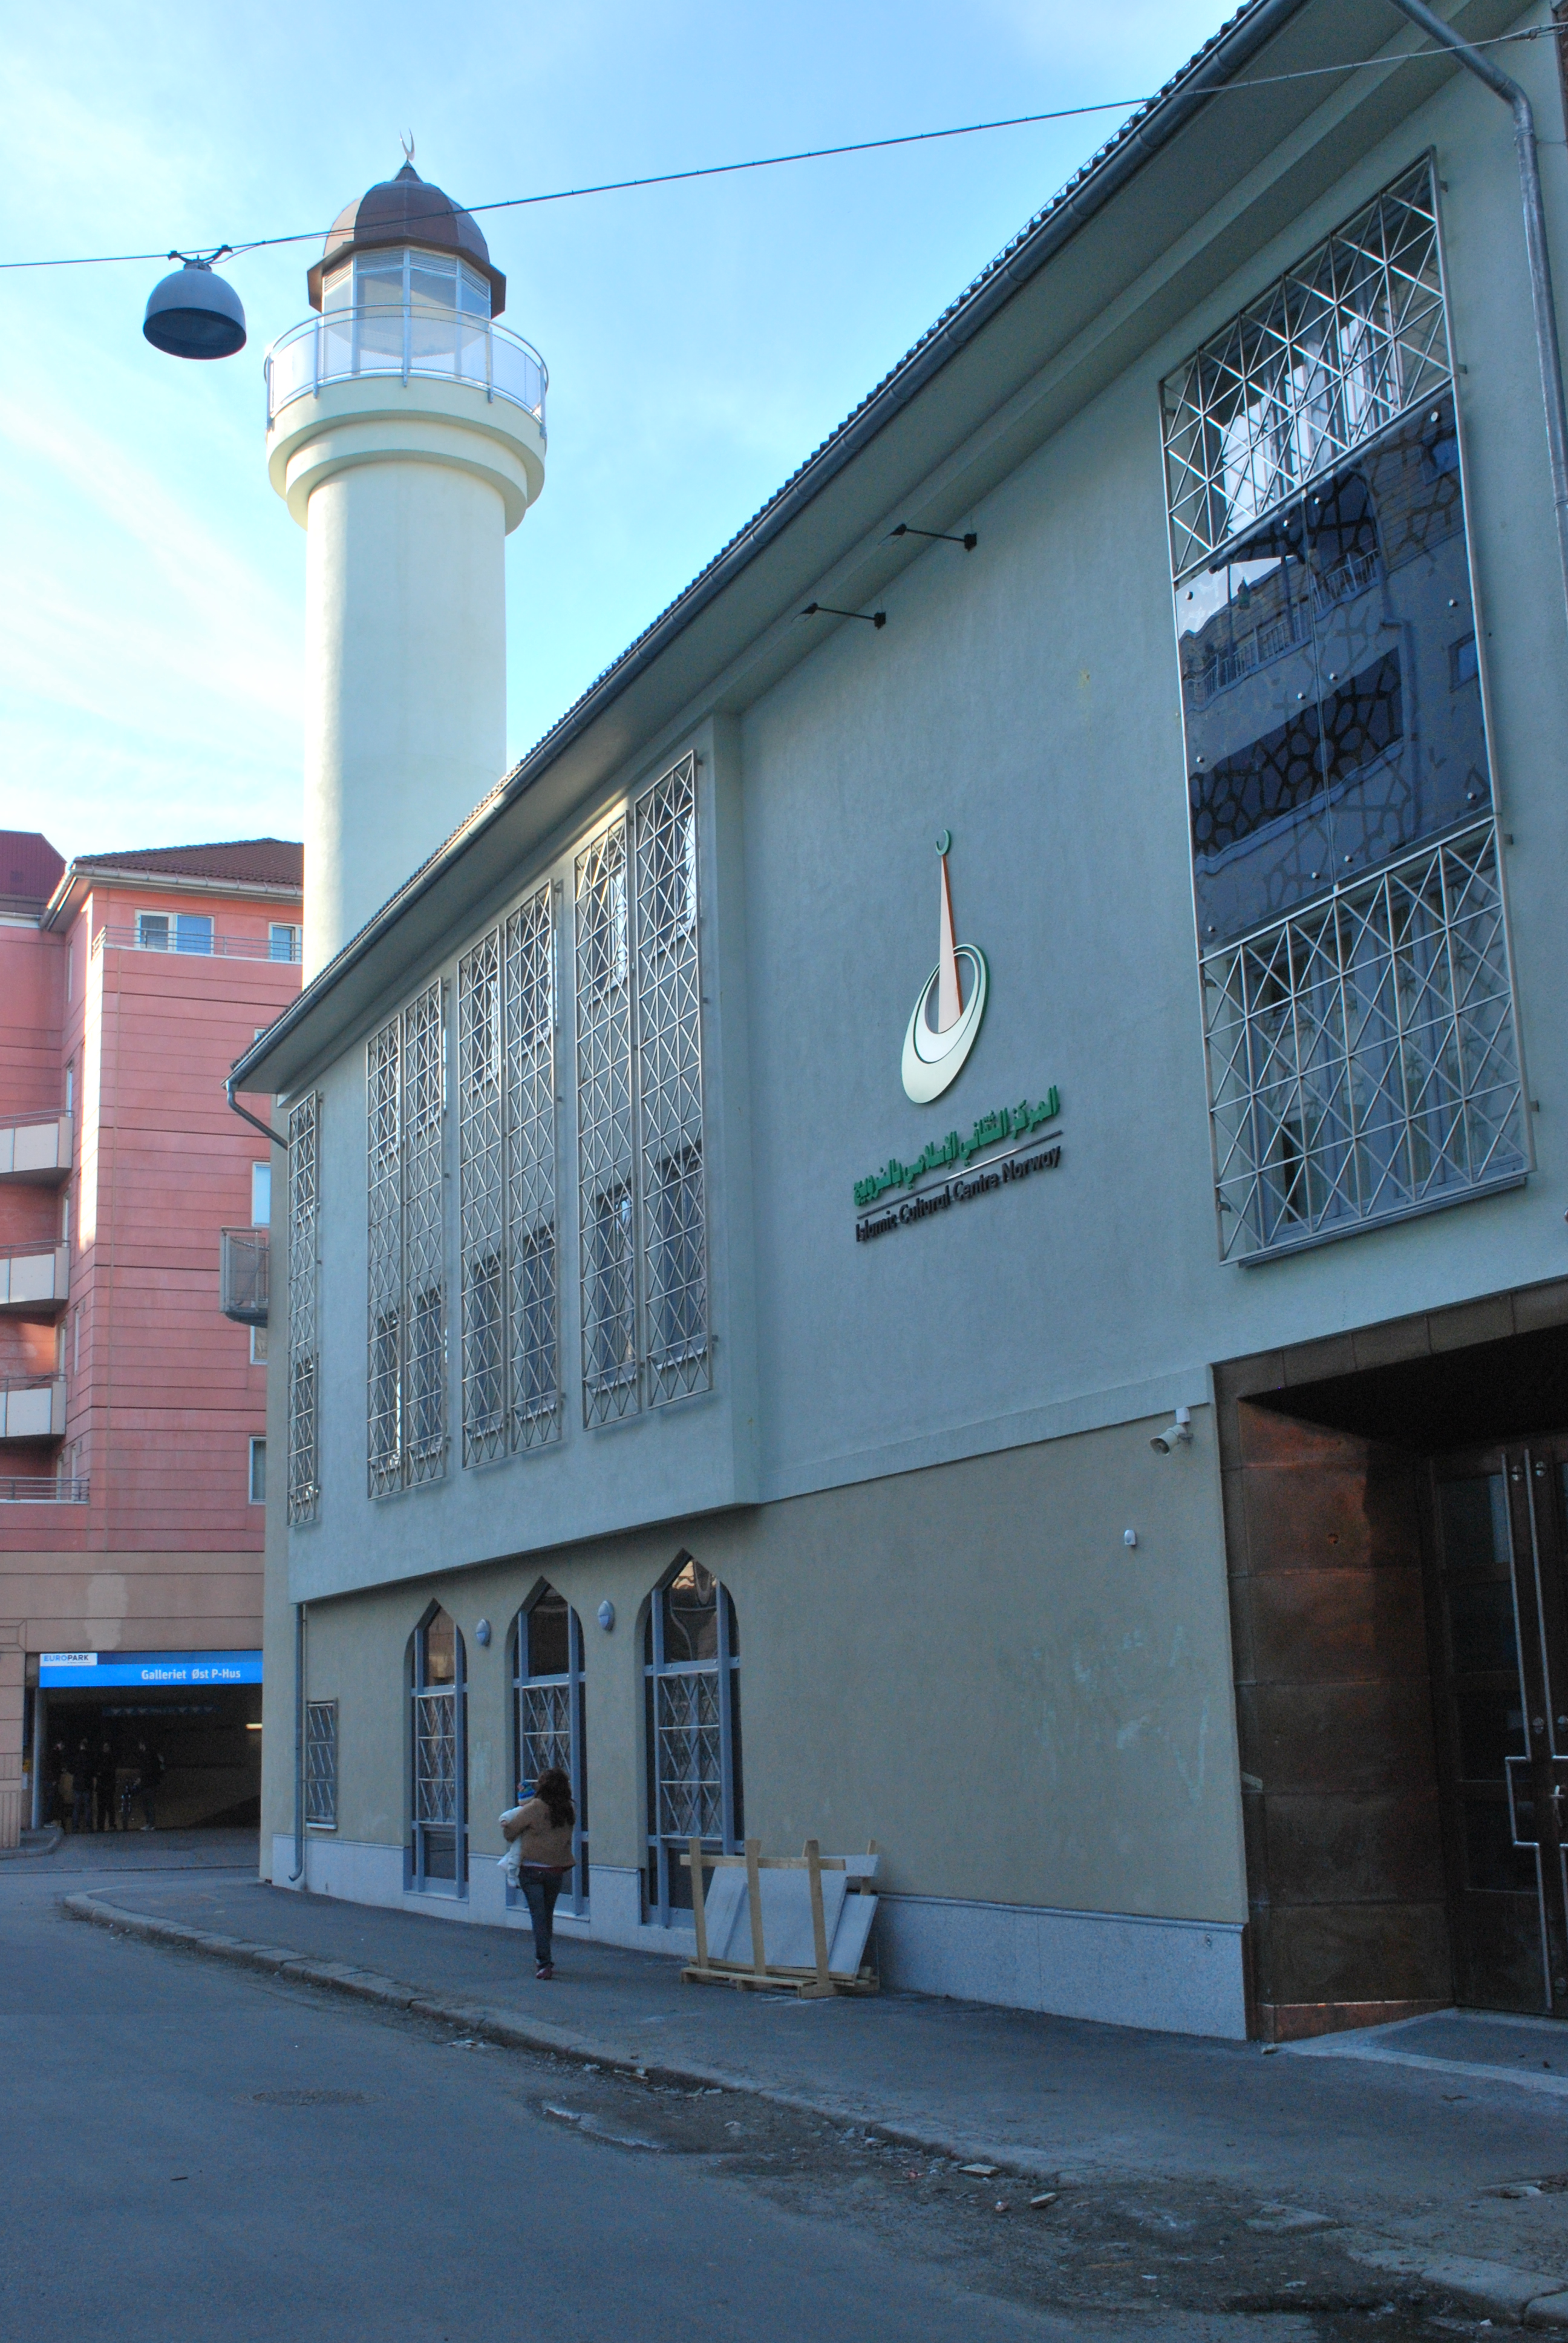 Islam In Norway: Norway Refuses Millions Of Dollars From Saudi Arabia For